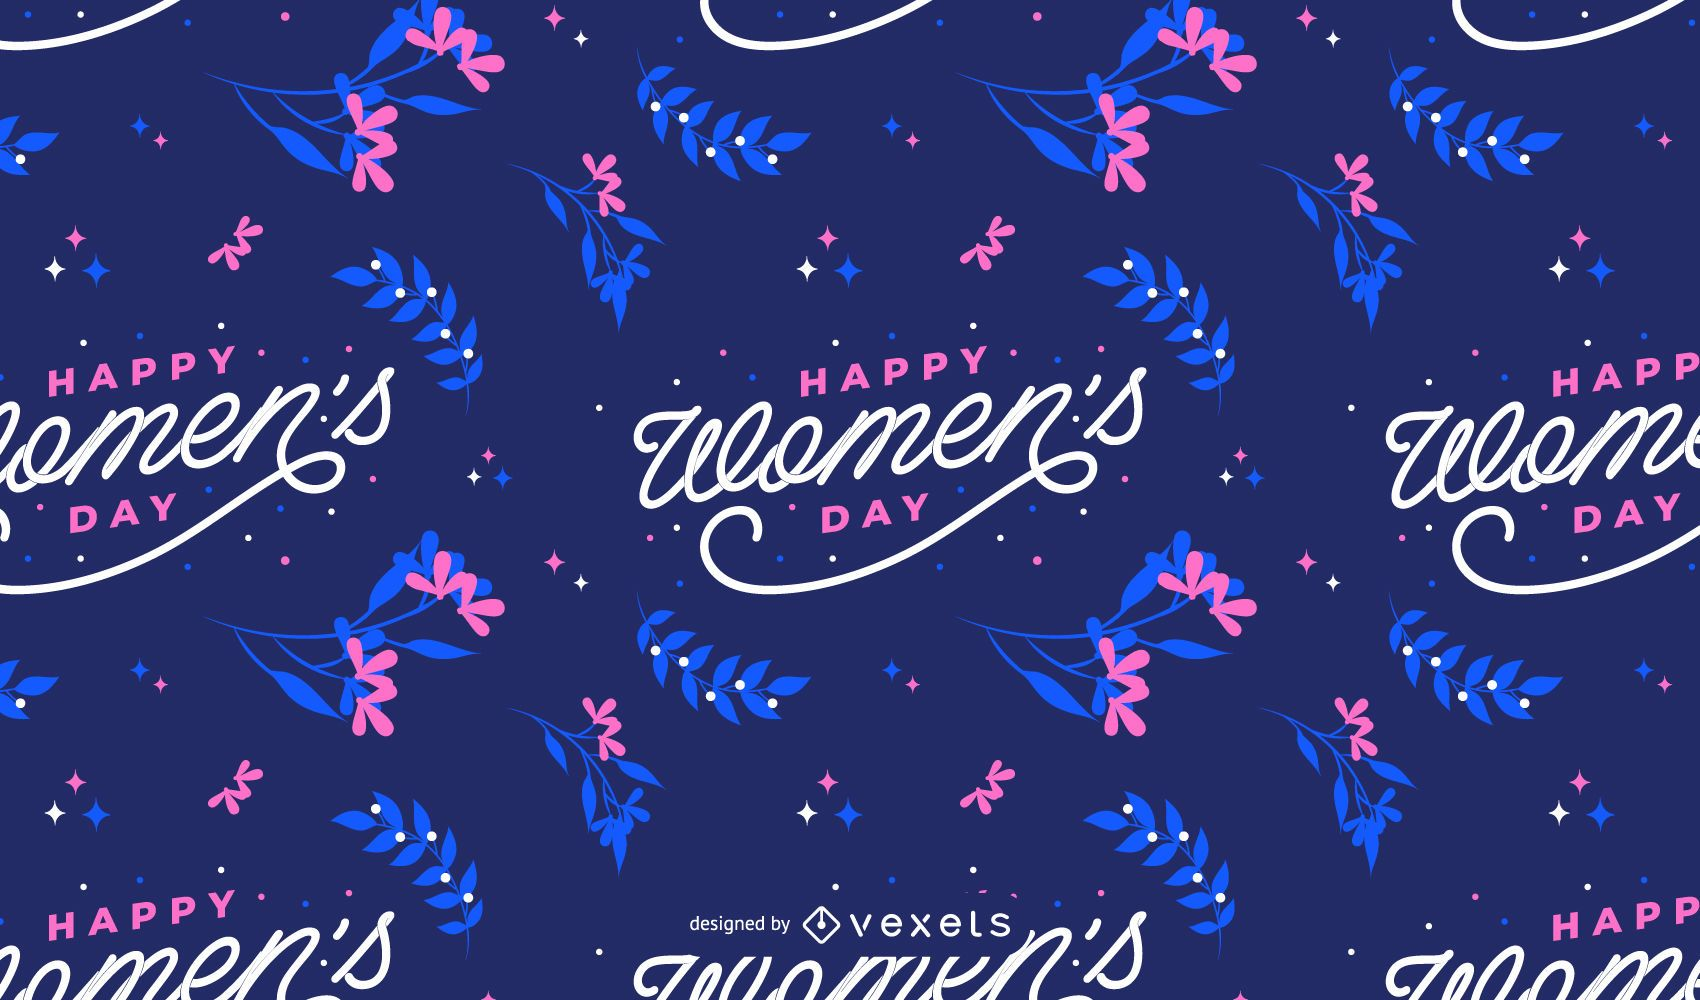 Happy Womens day pattern